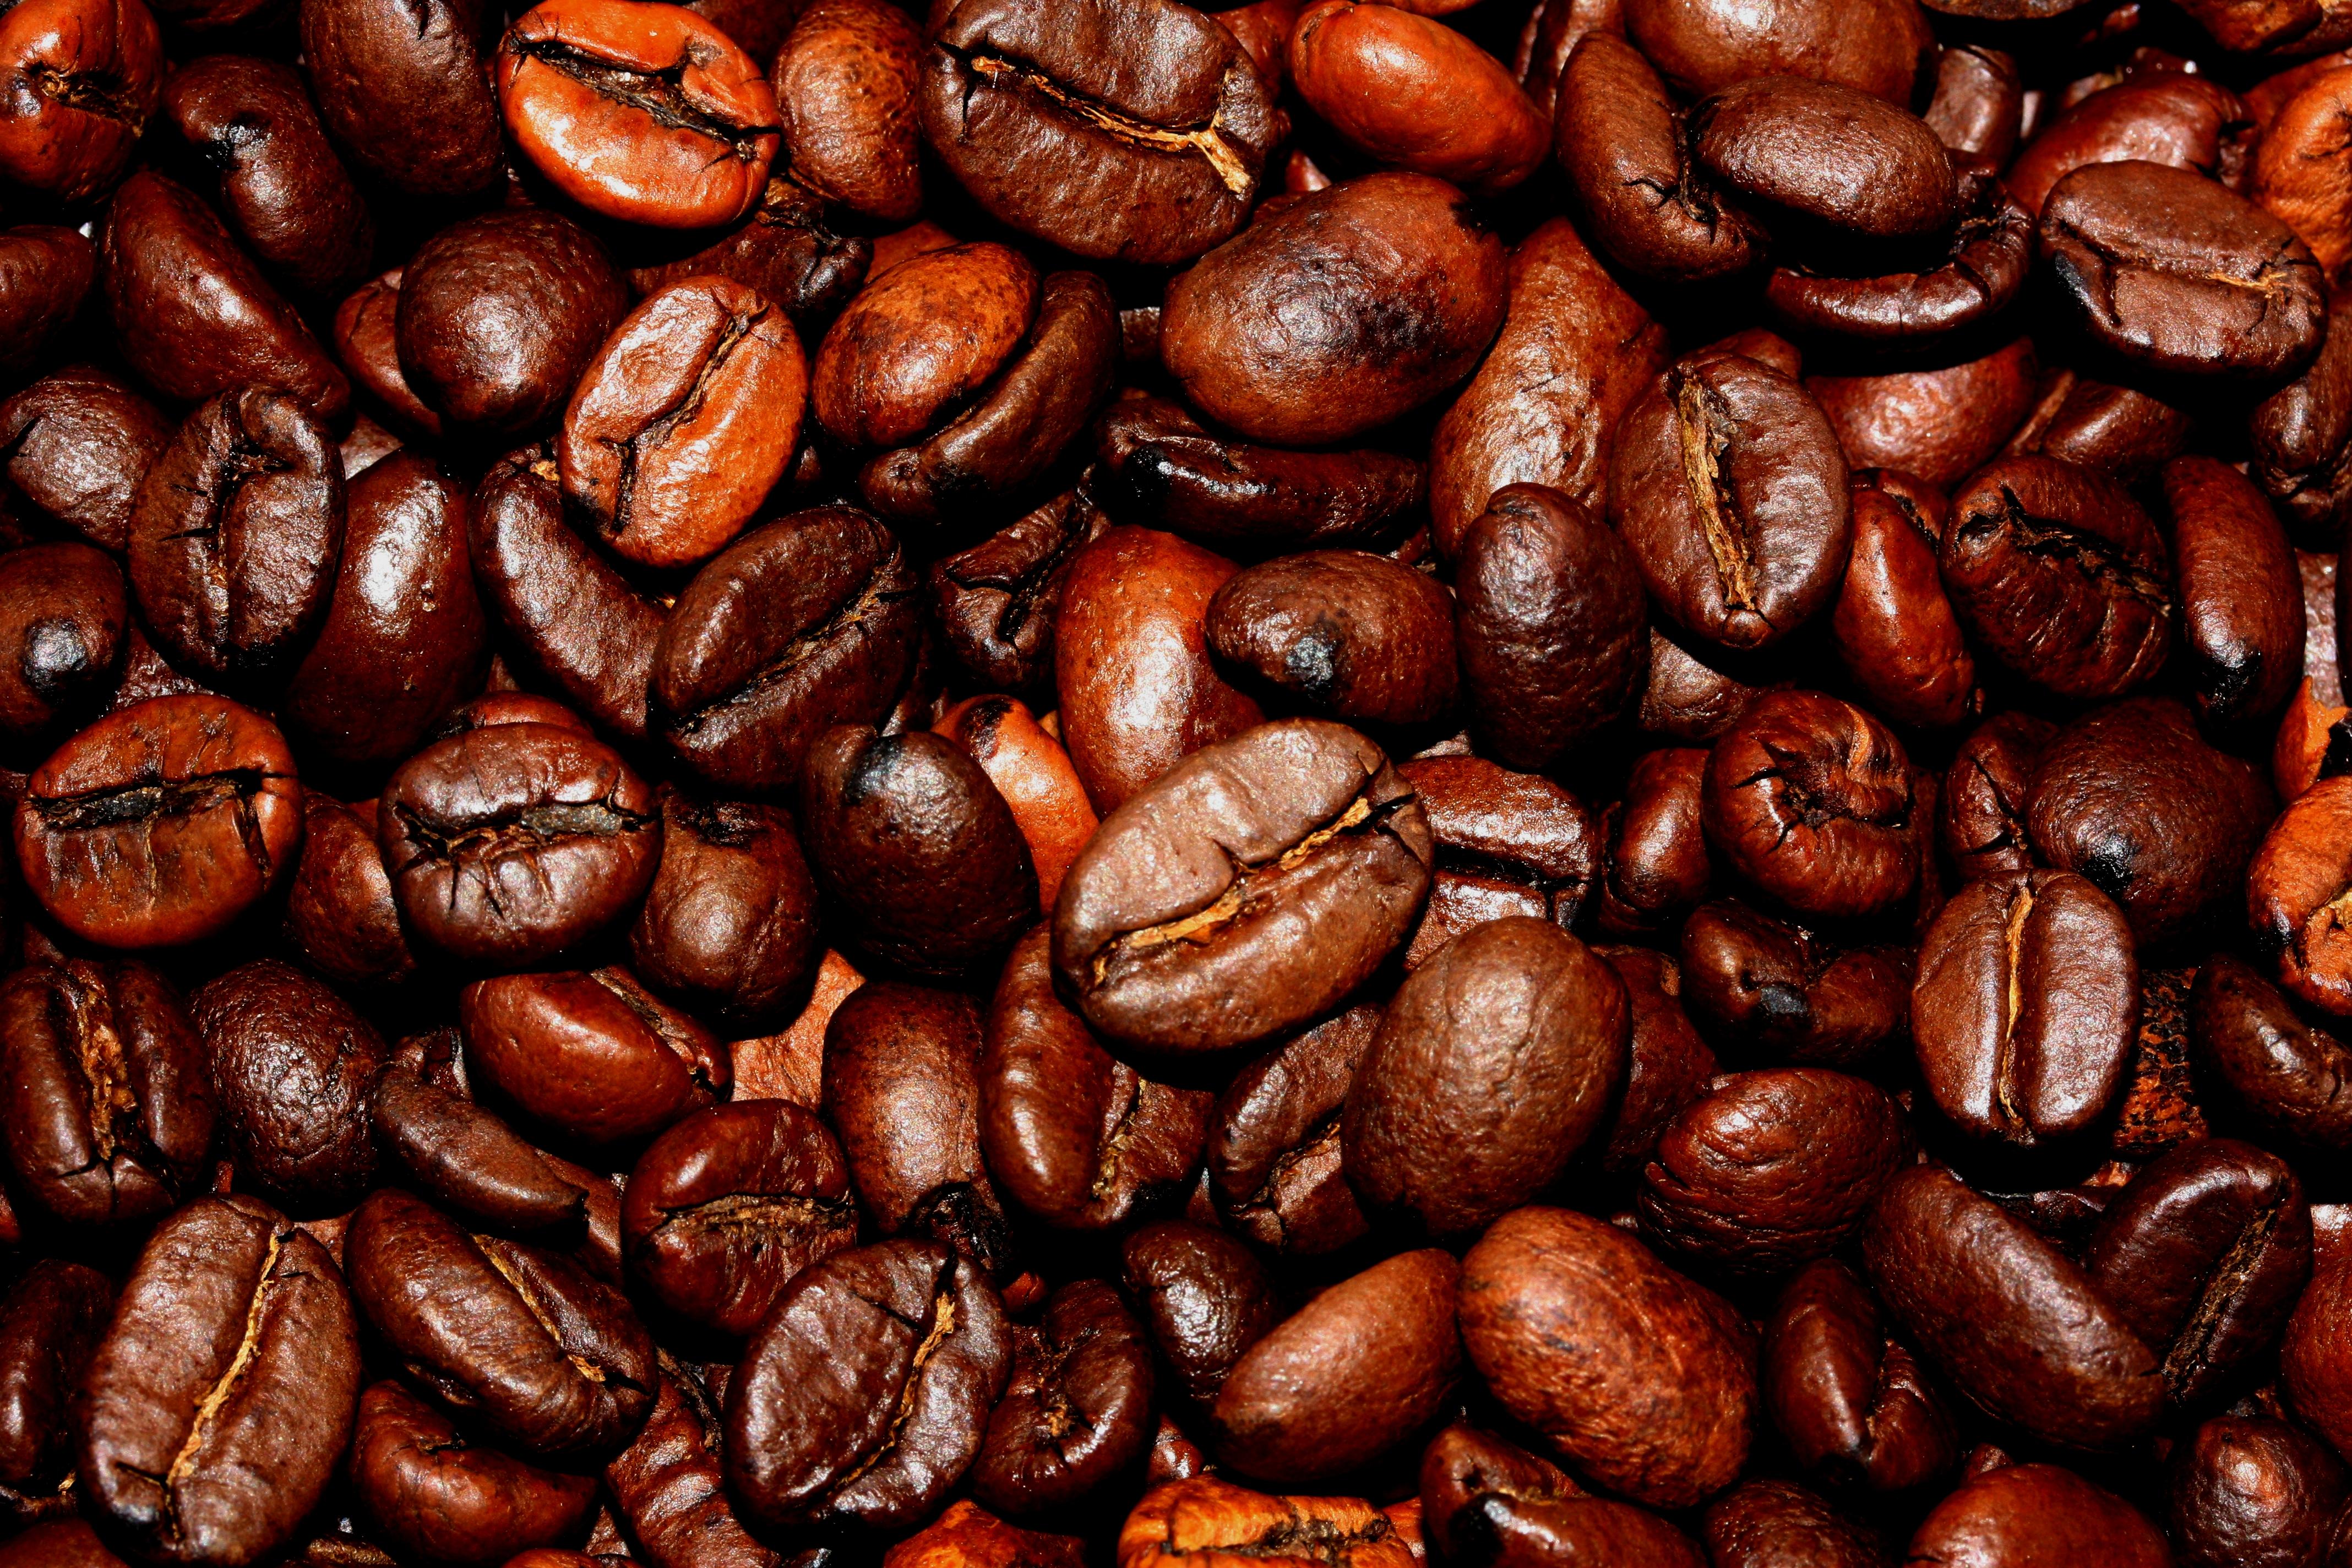 Coffee Beans (2732722806)